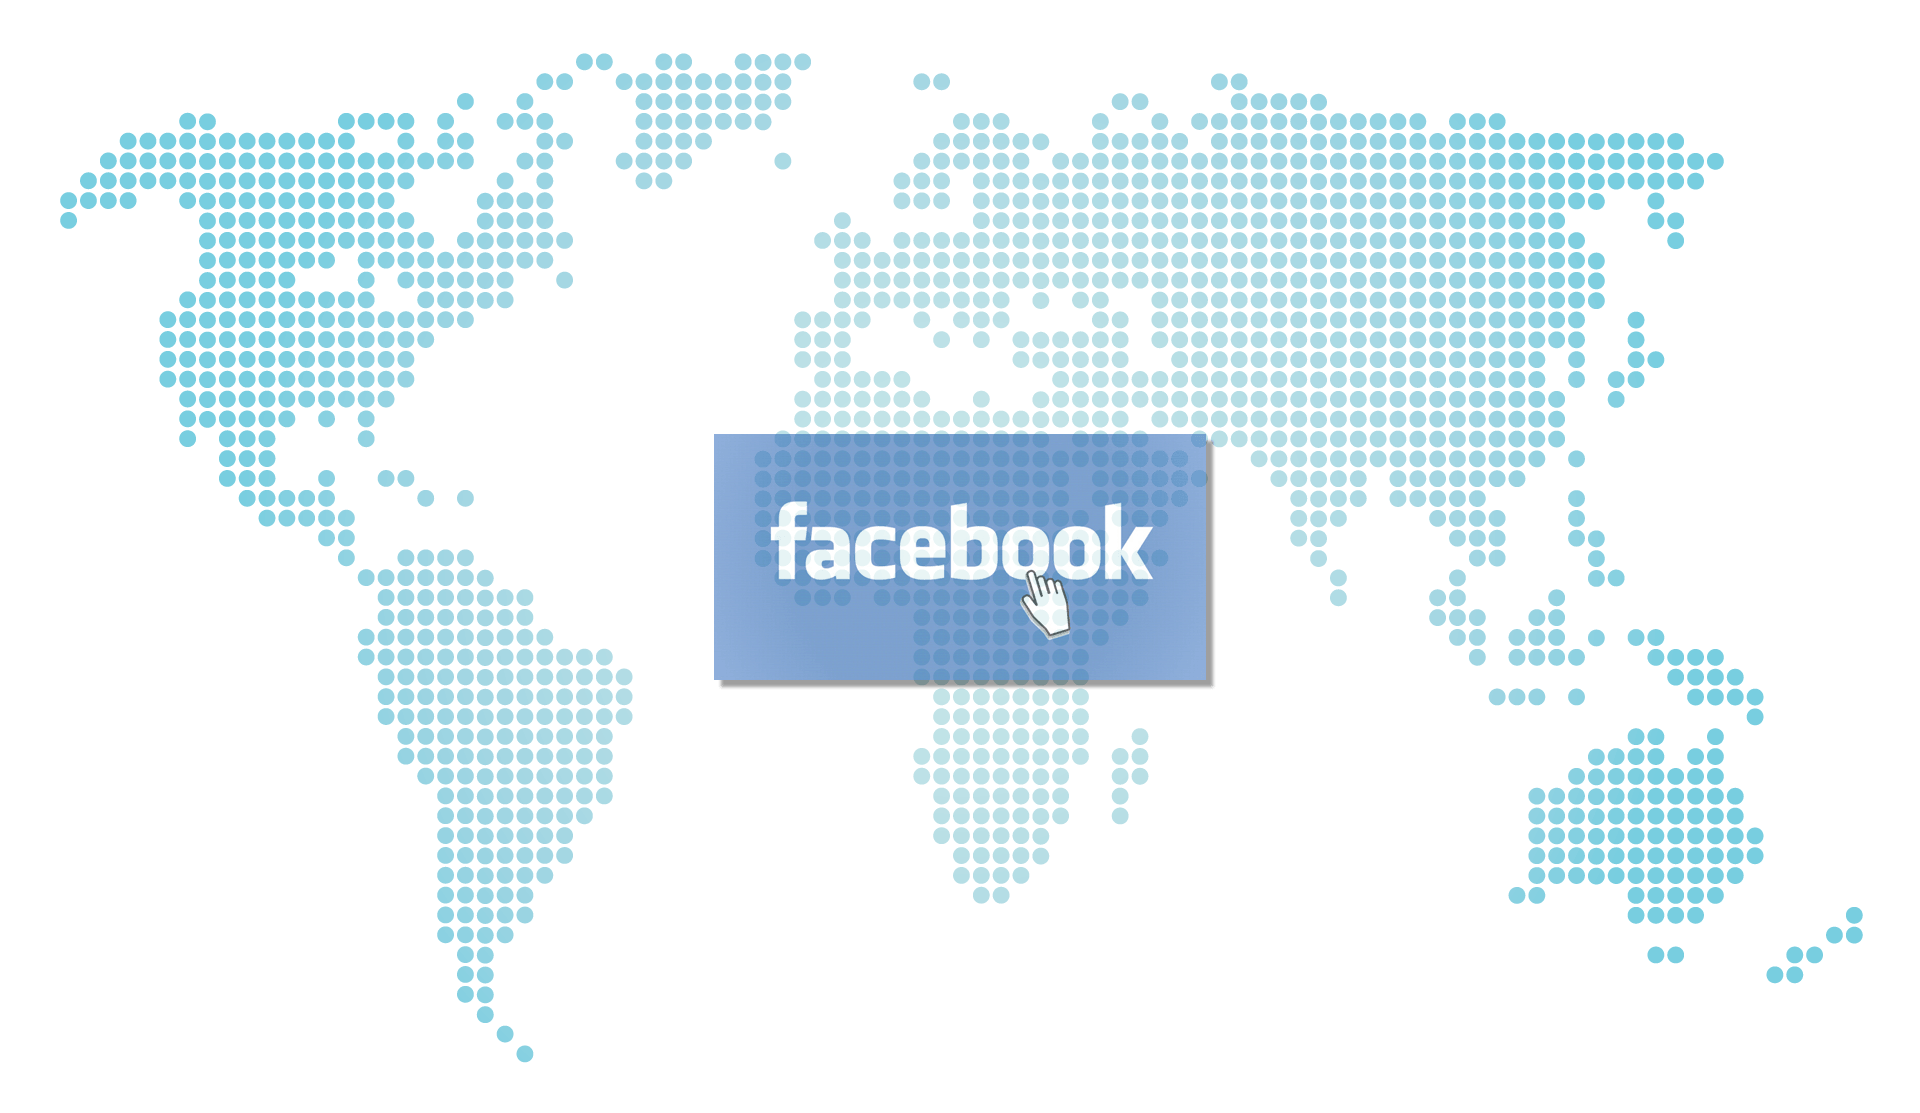 Mondo+FB - trasp